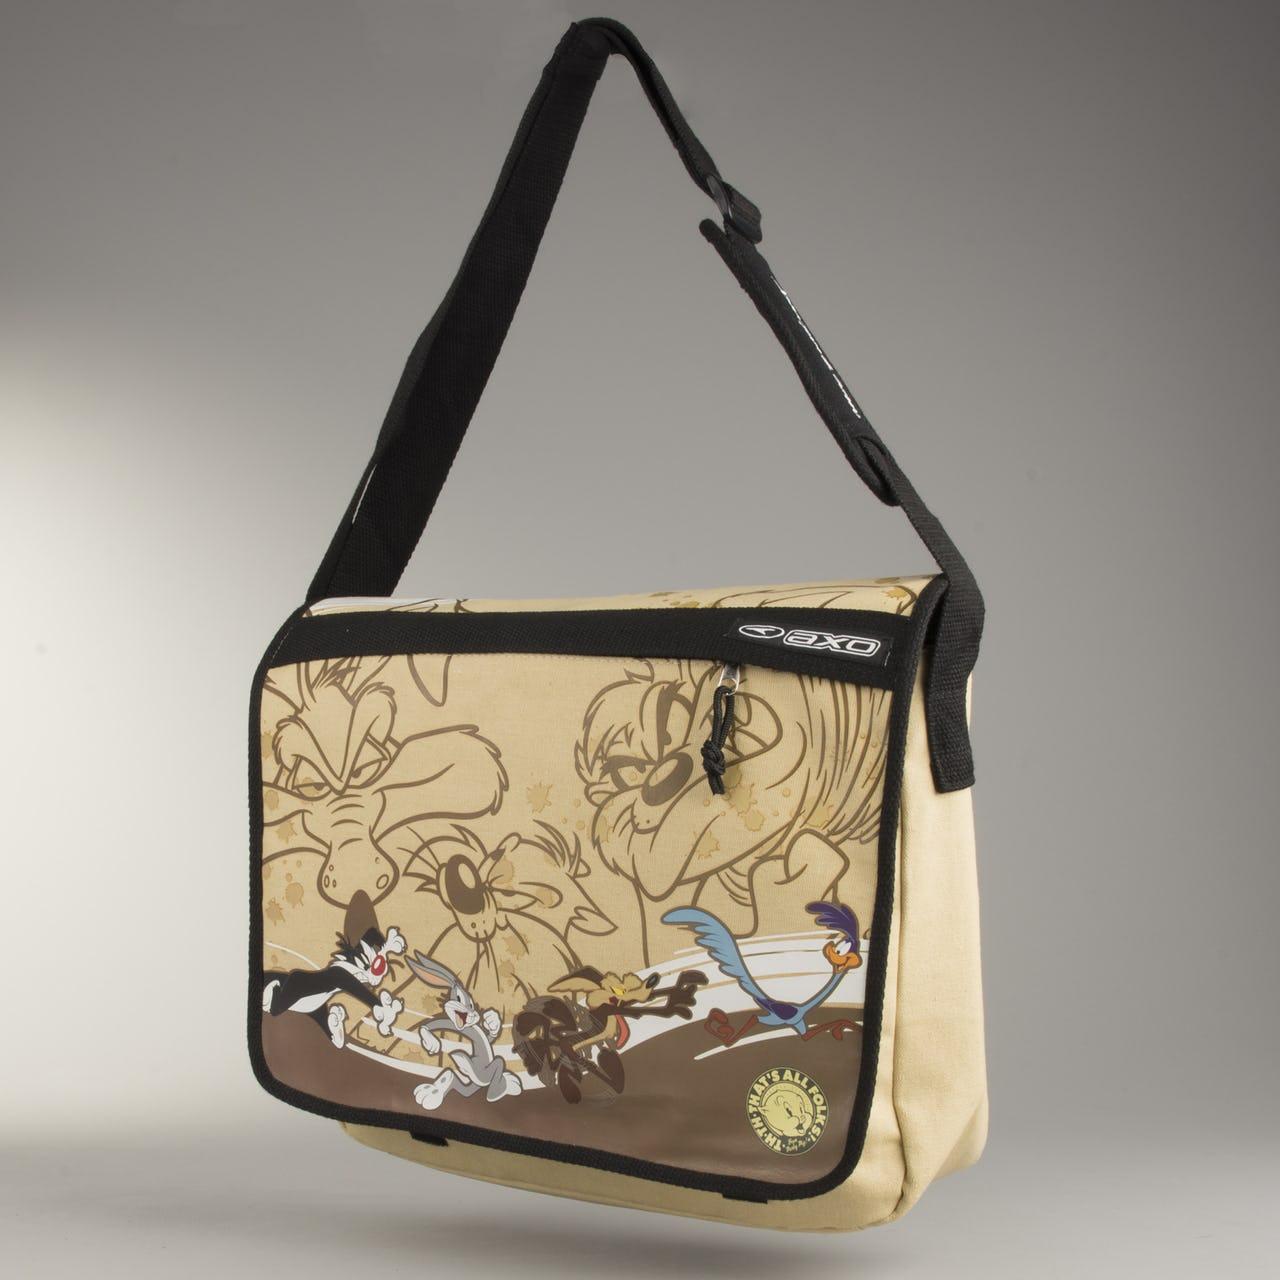 AXO Superman Shoulder Bag Looney Tunes Brown - £12.89 + £3.95 postage @ 24MX